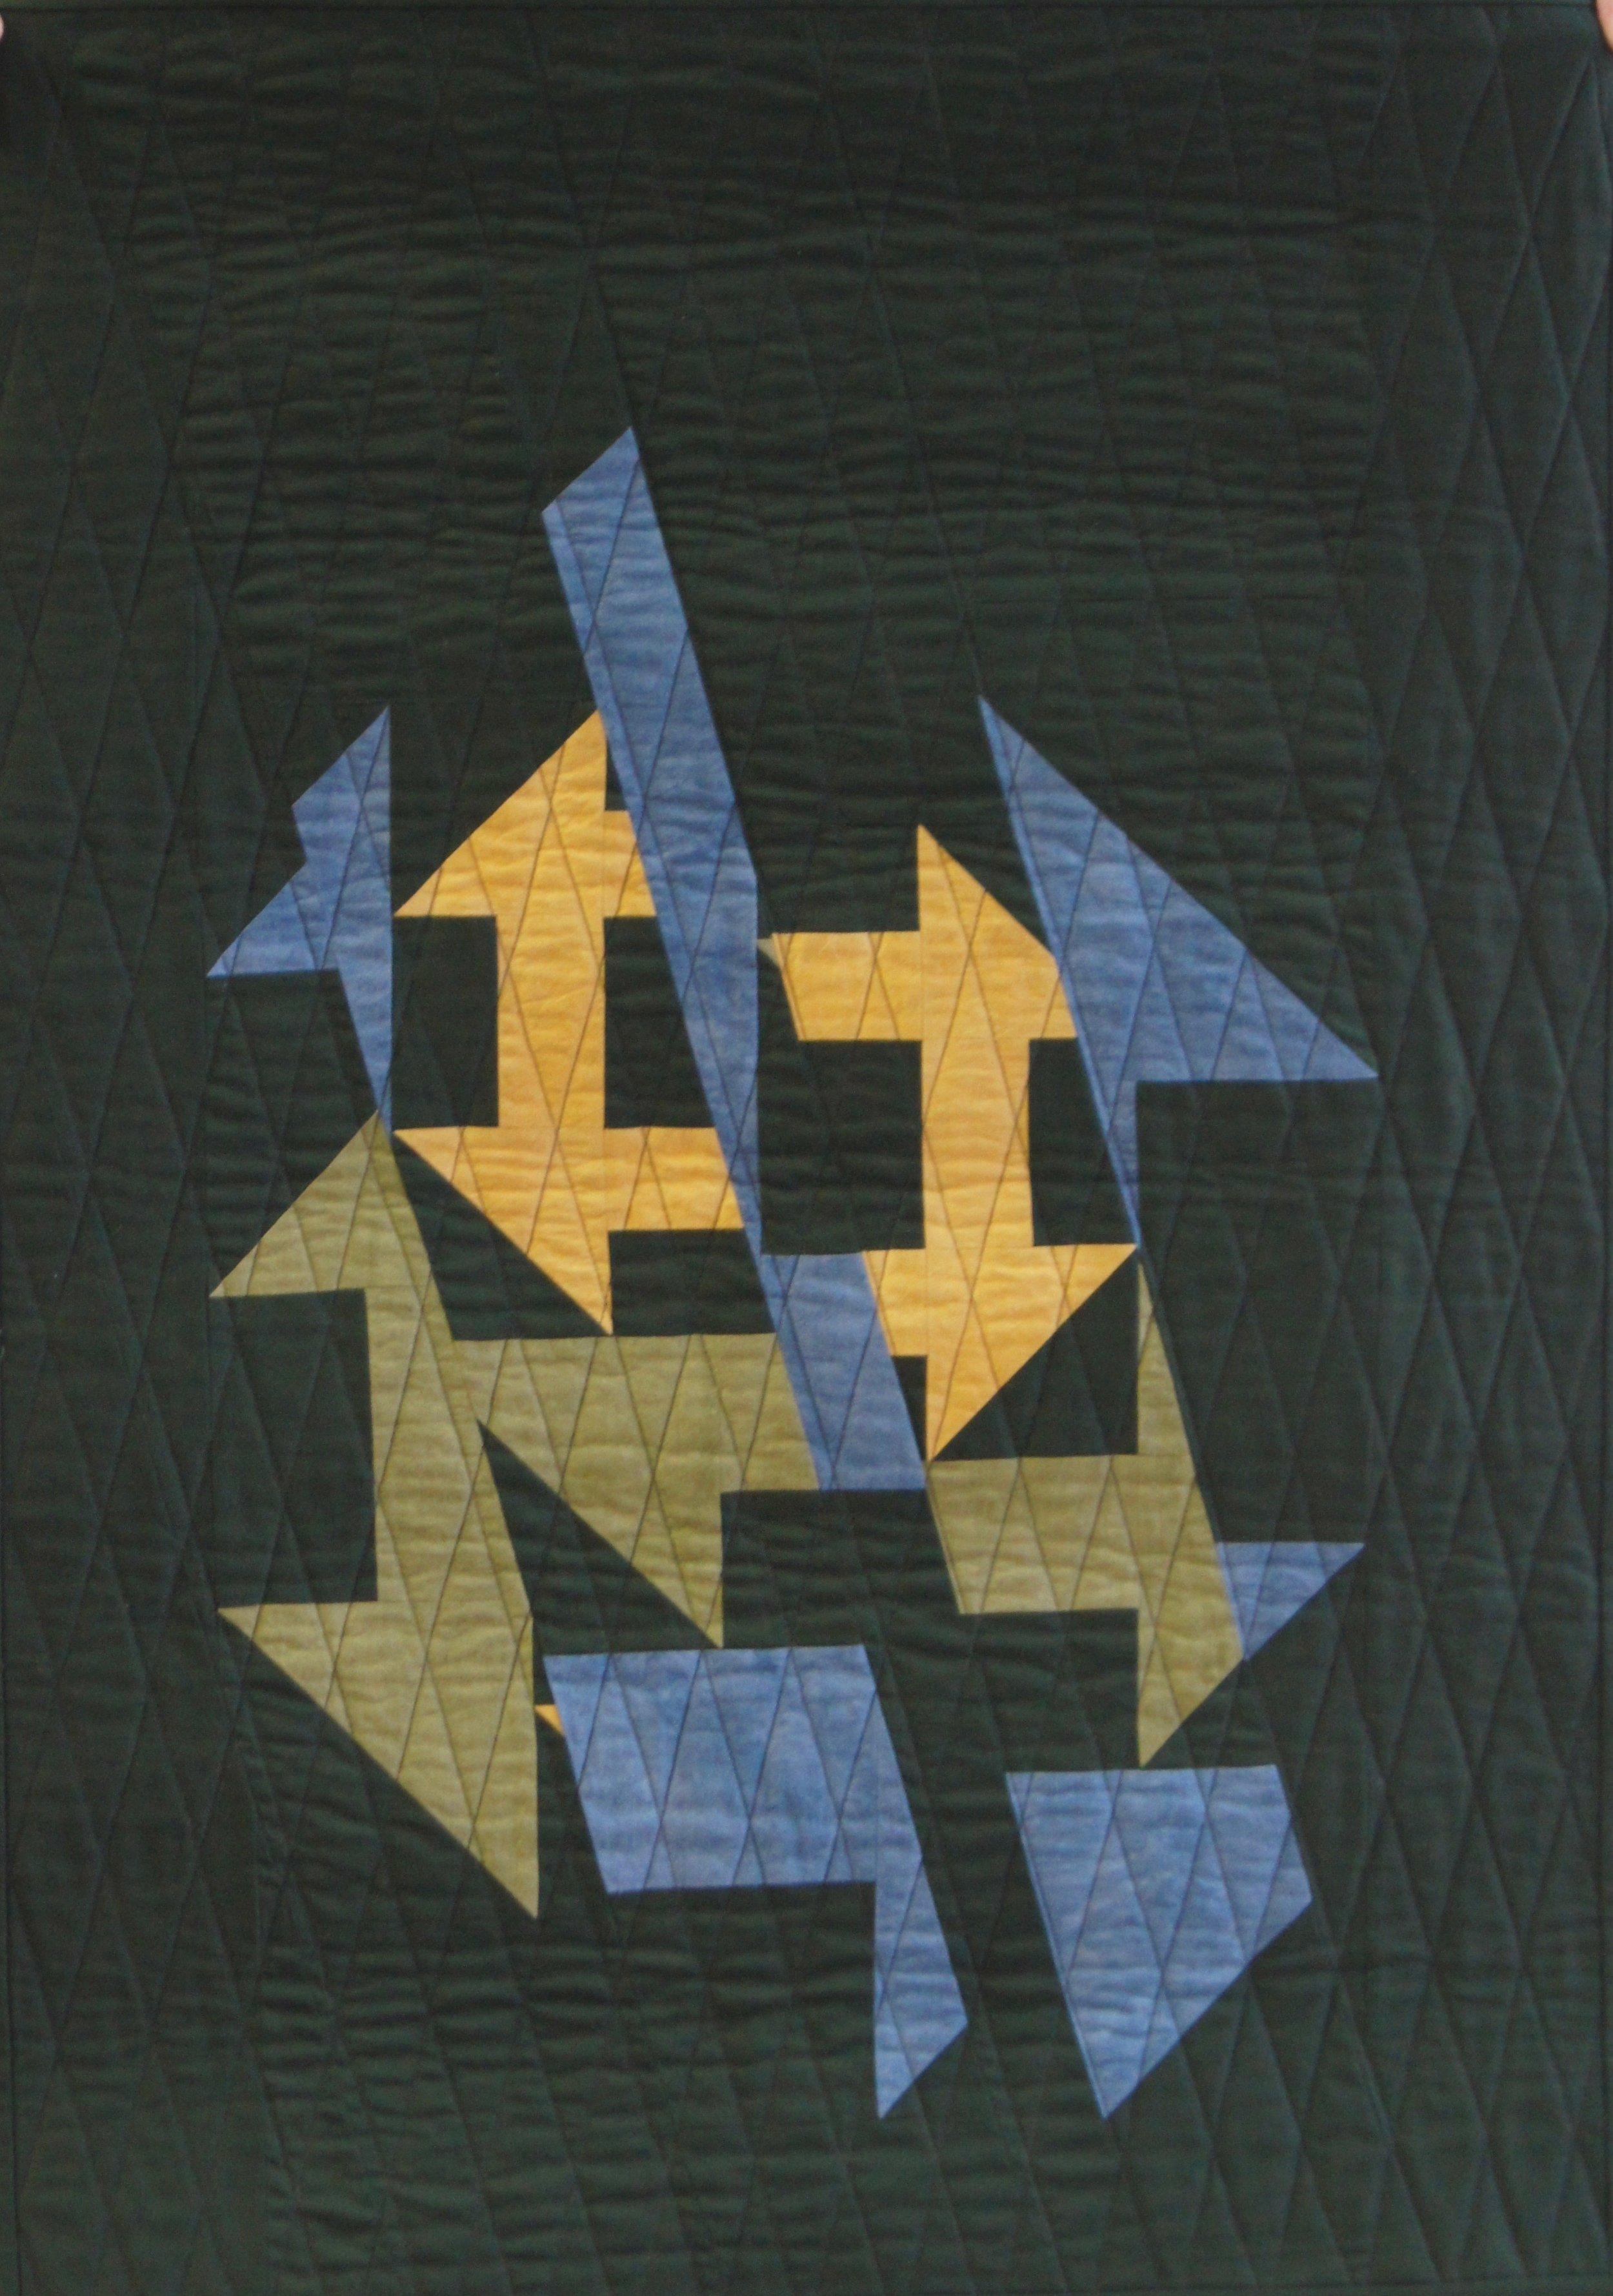 Sliced Churn Dashes by Jean Larson